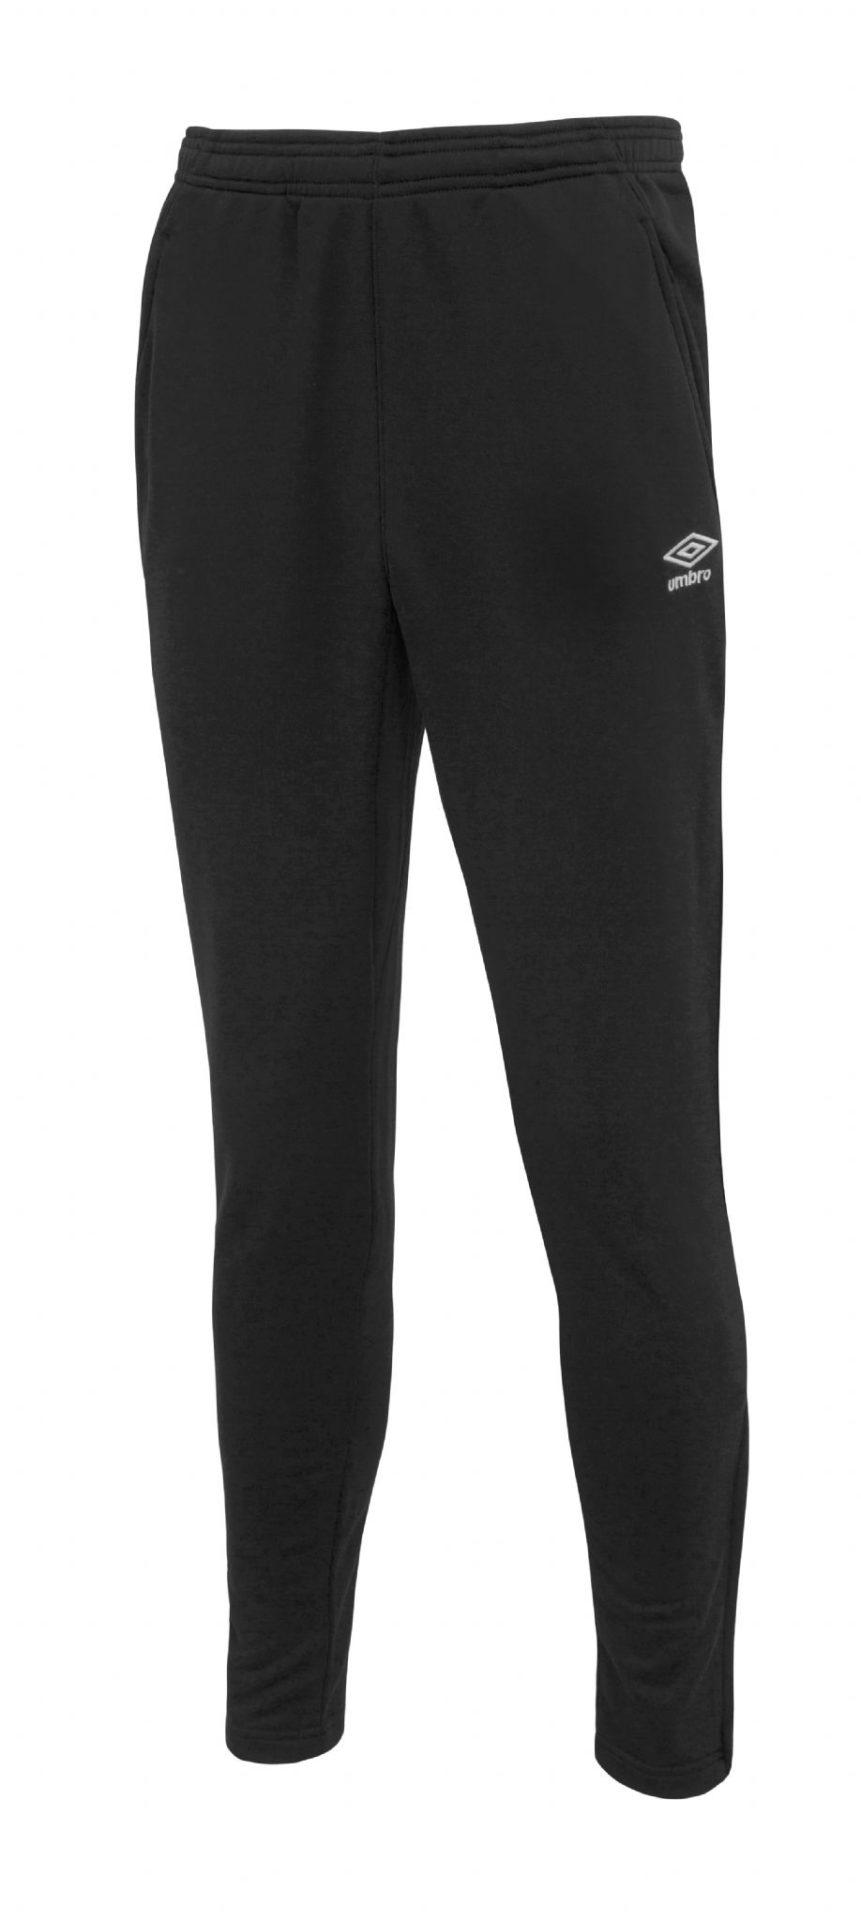 umbro skinny pants black 30533 p scaled